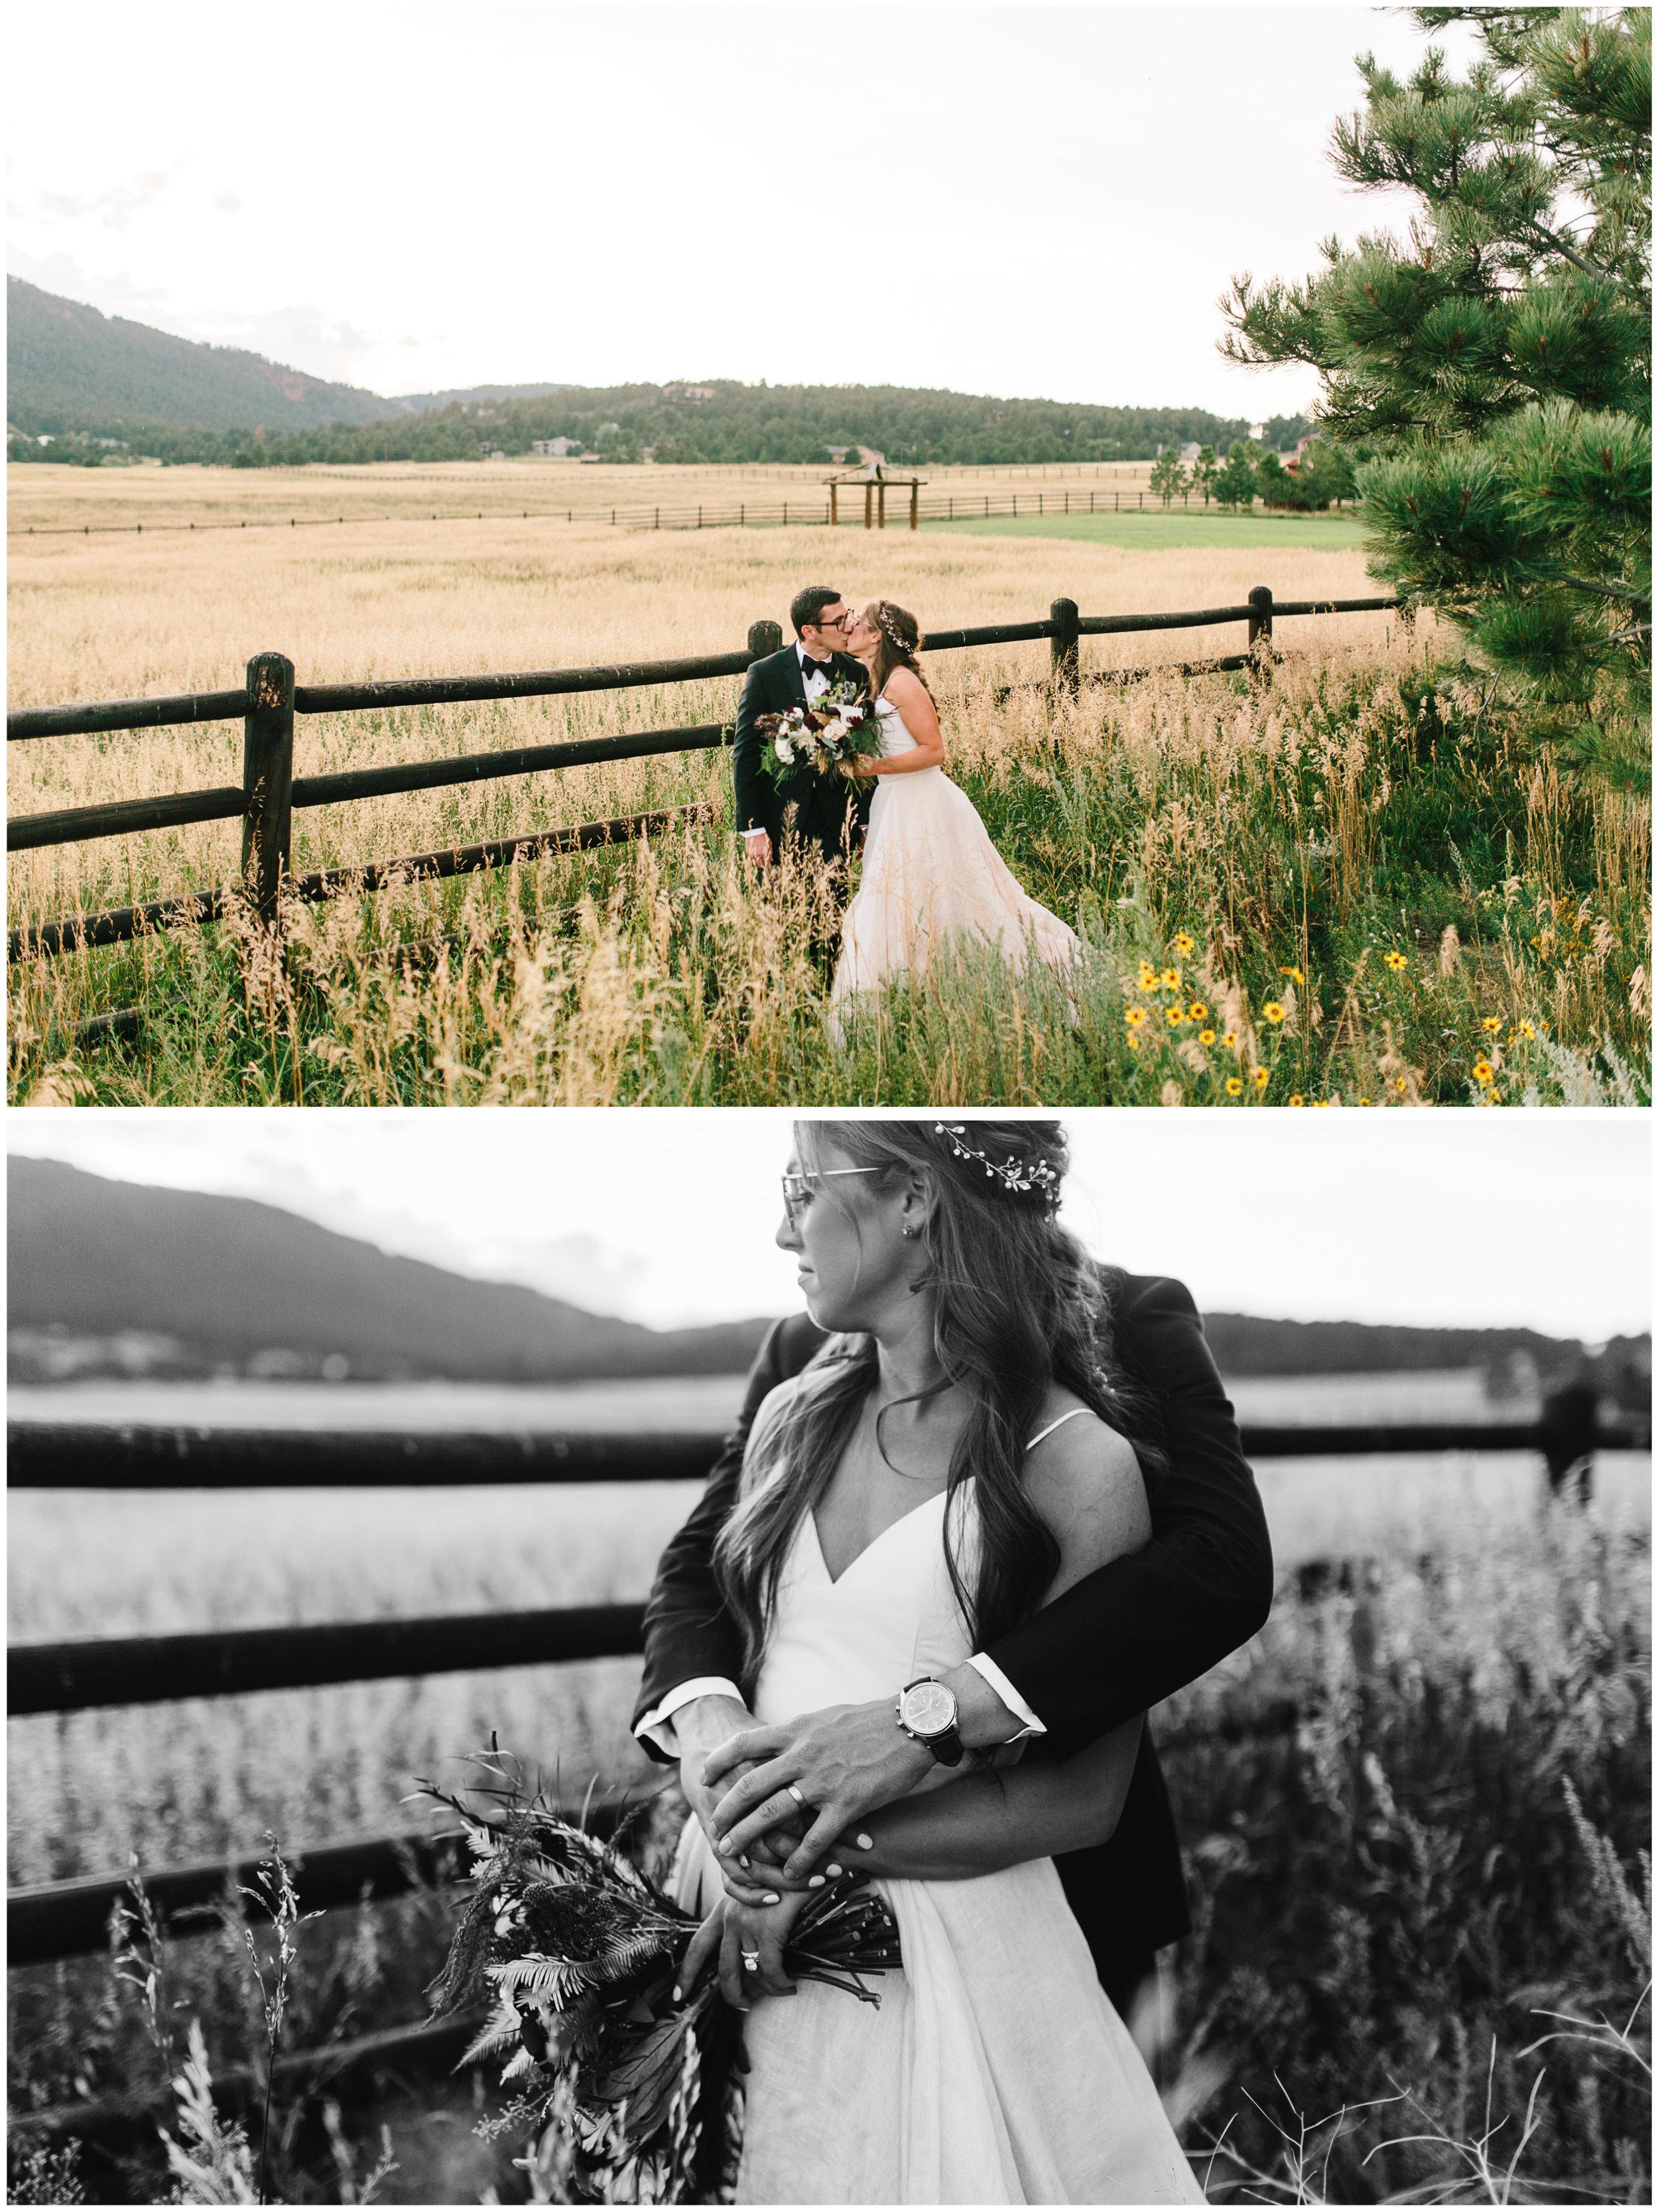 spruce_mountain_ranch_wedding_63.jpg